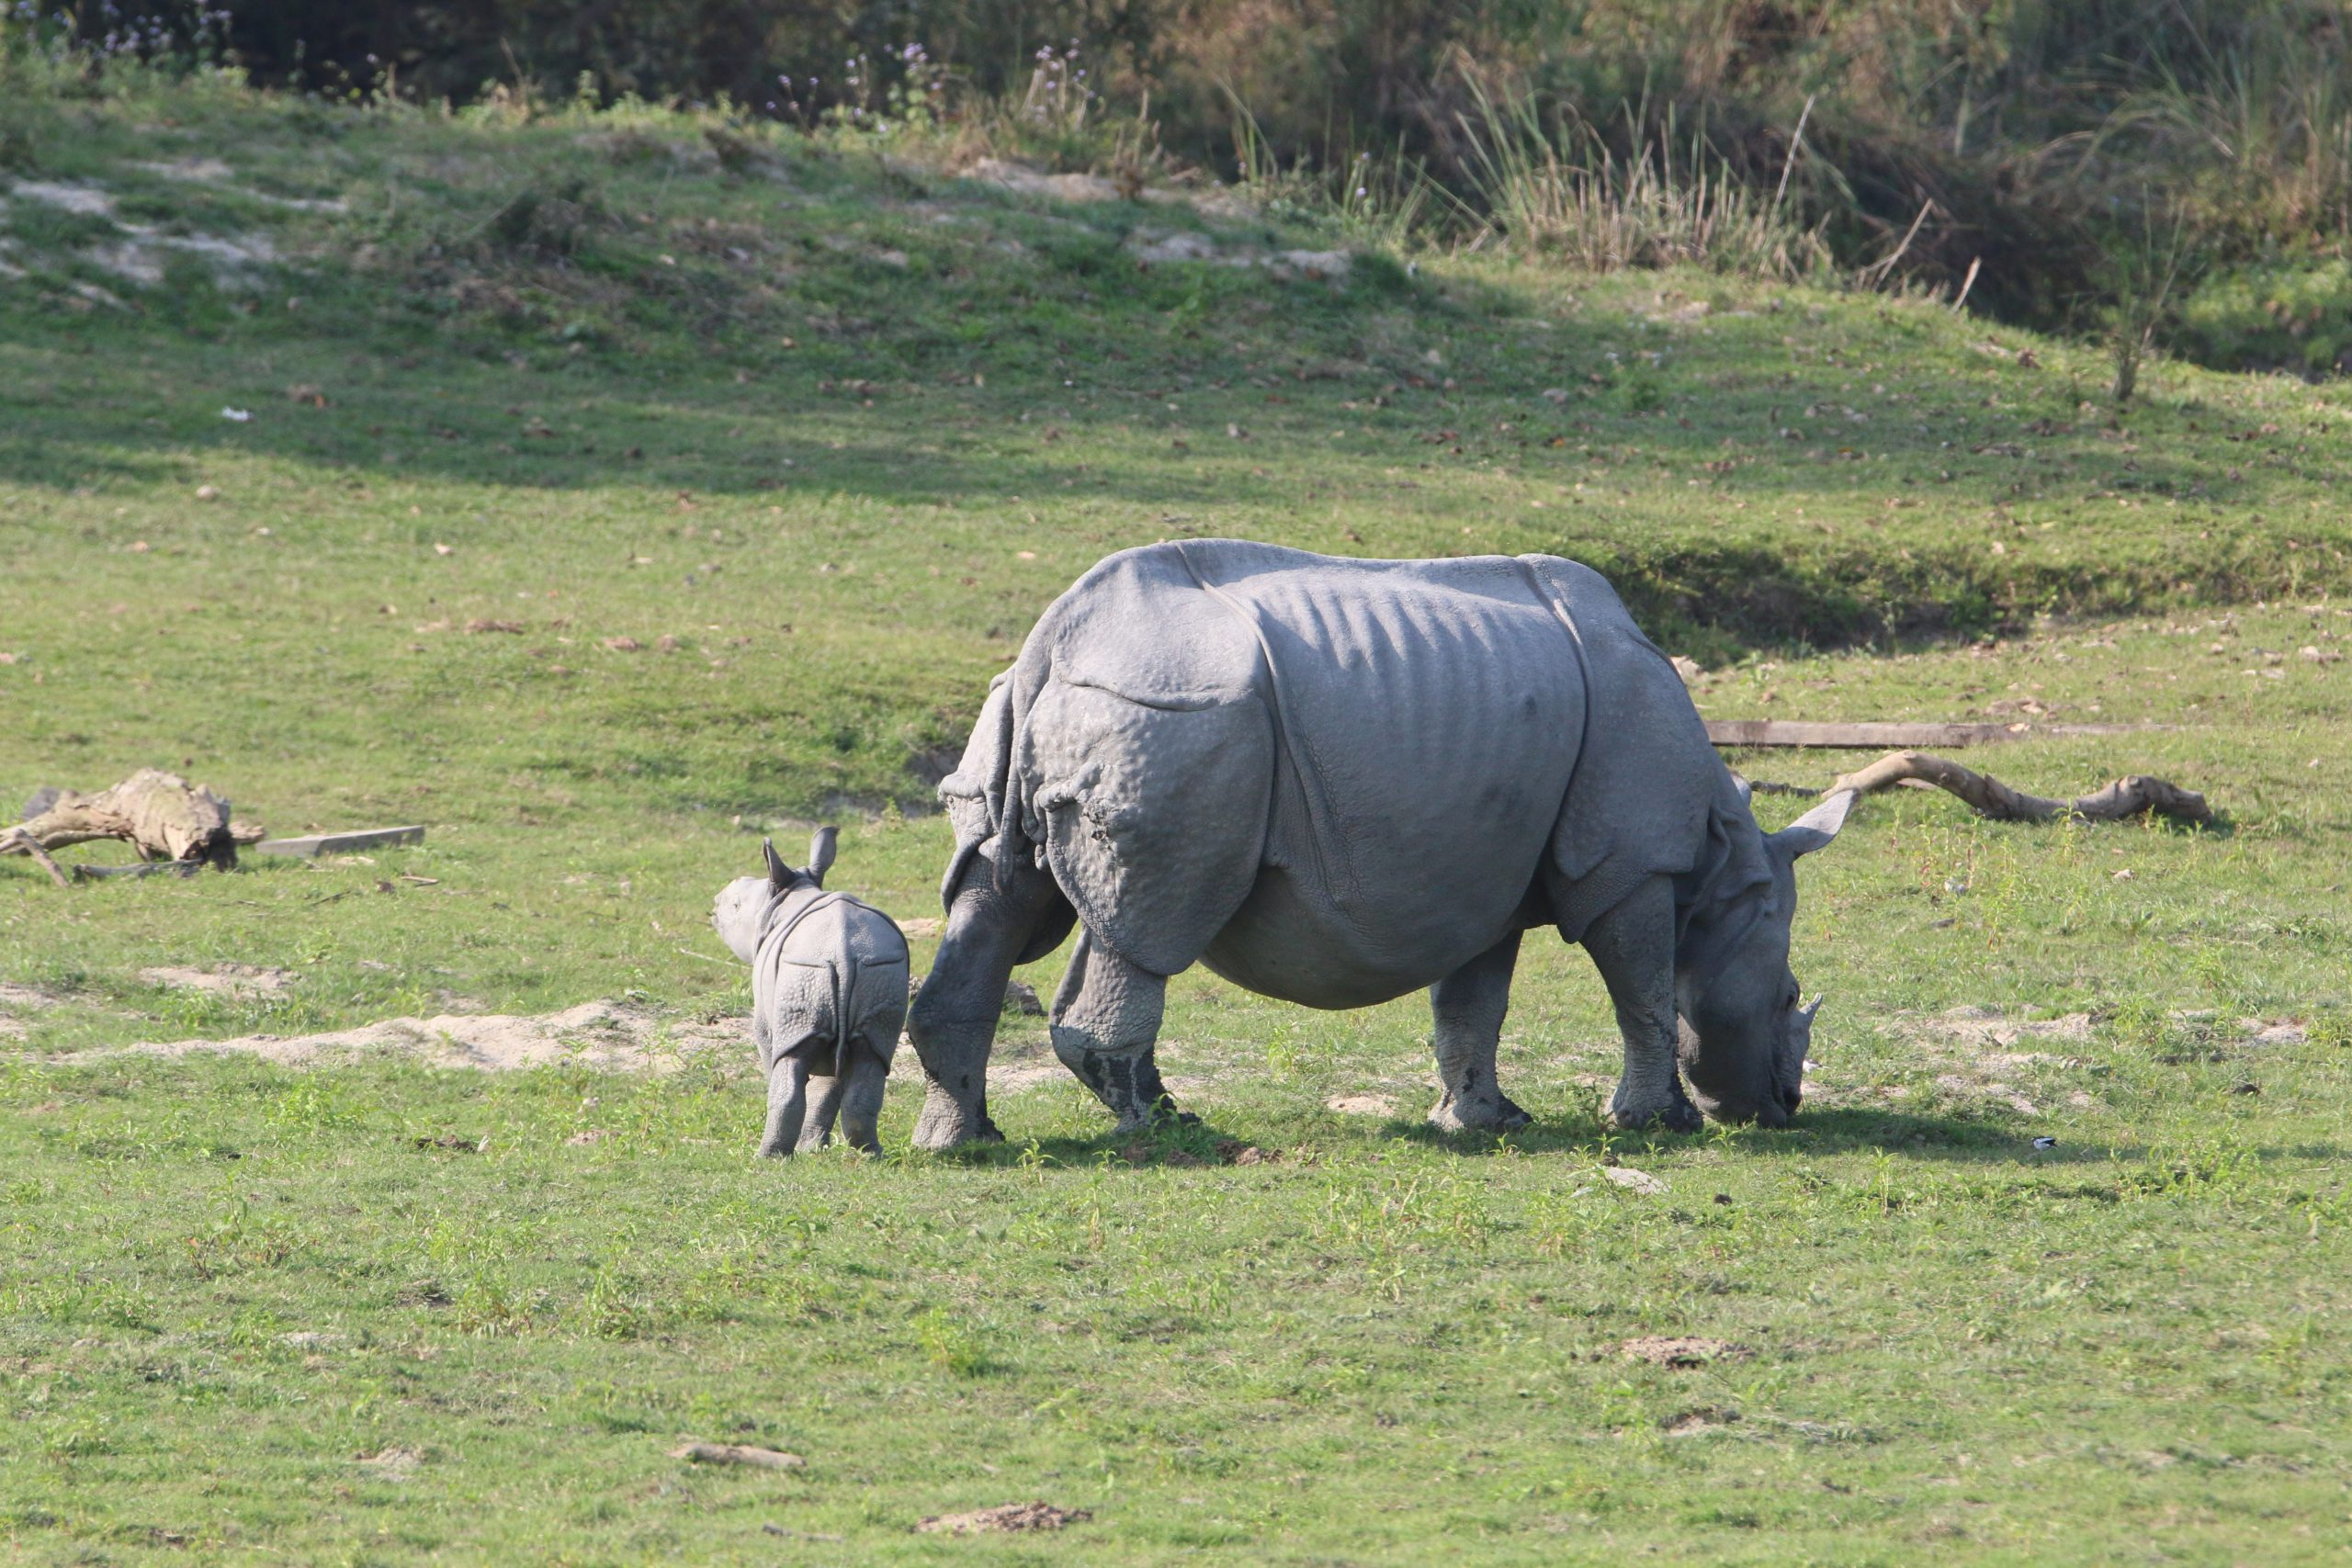 Rhino with a calf